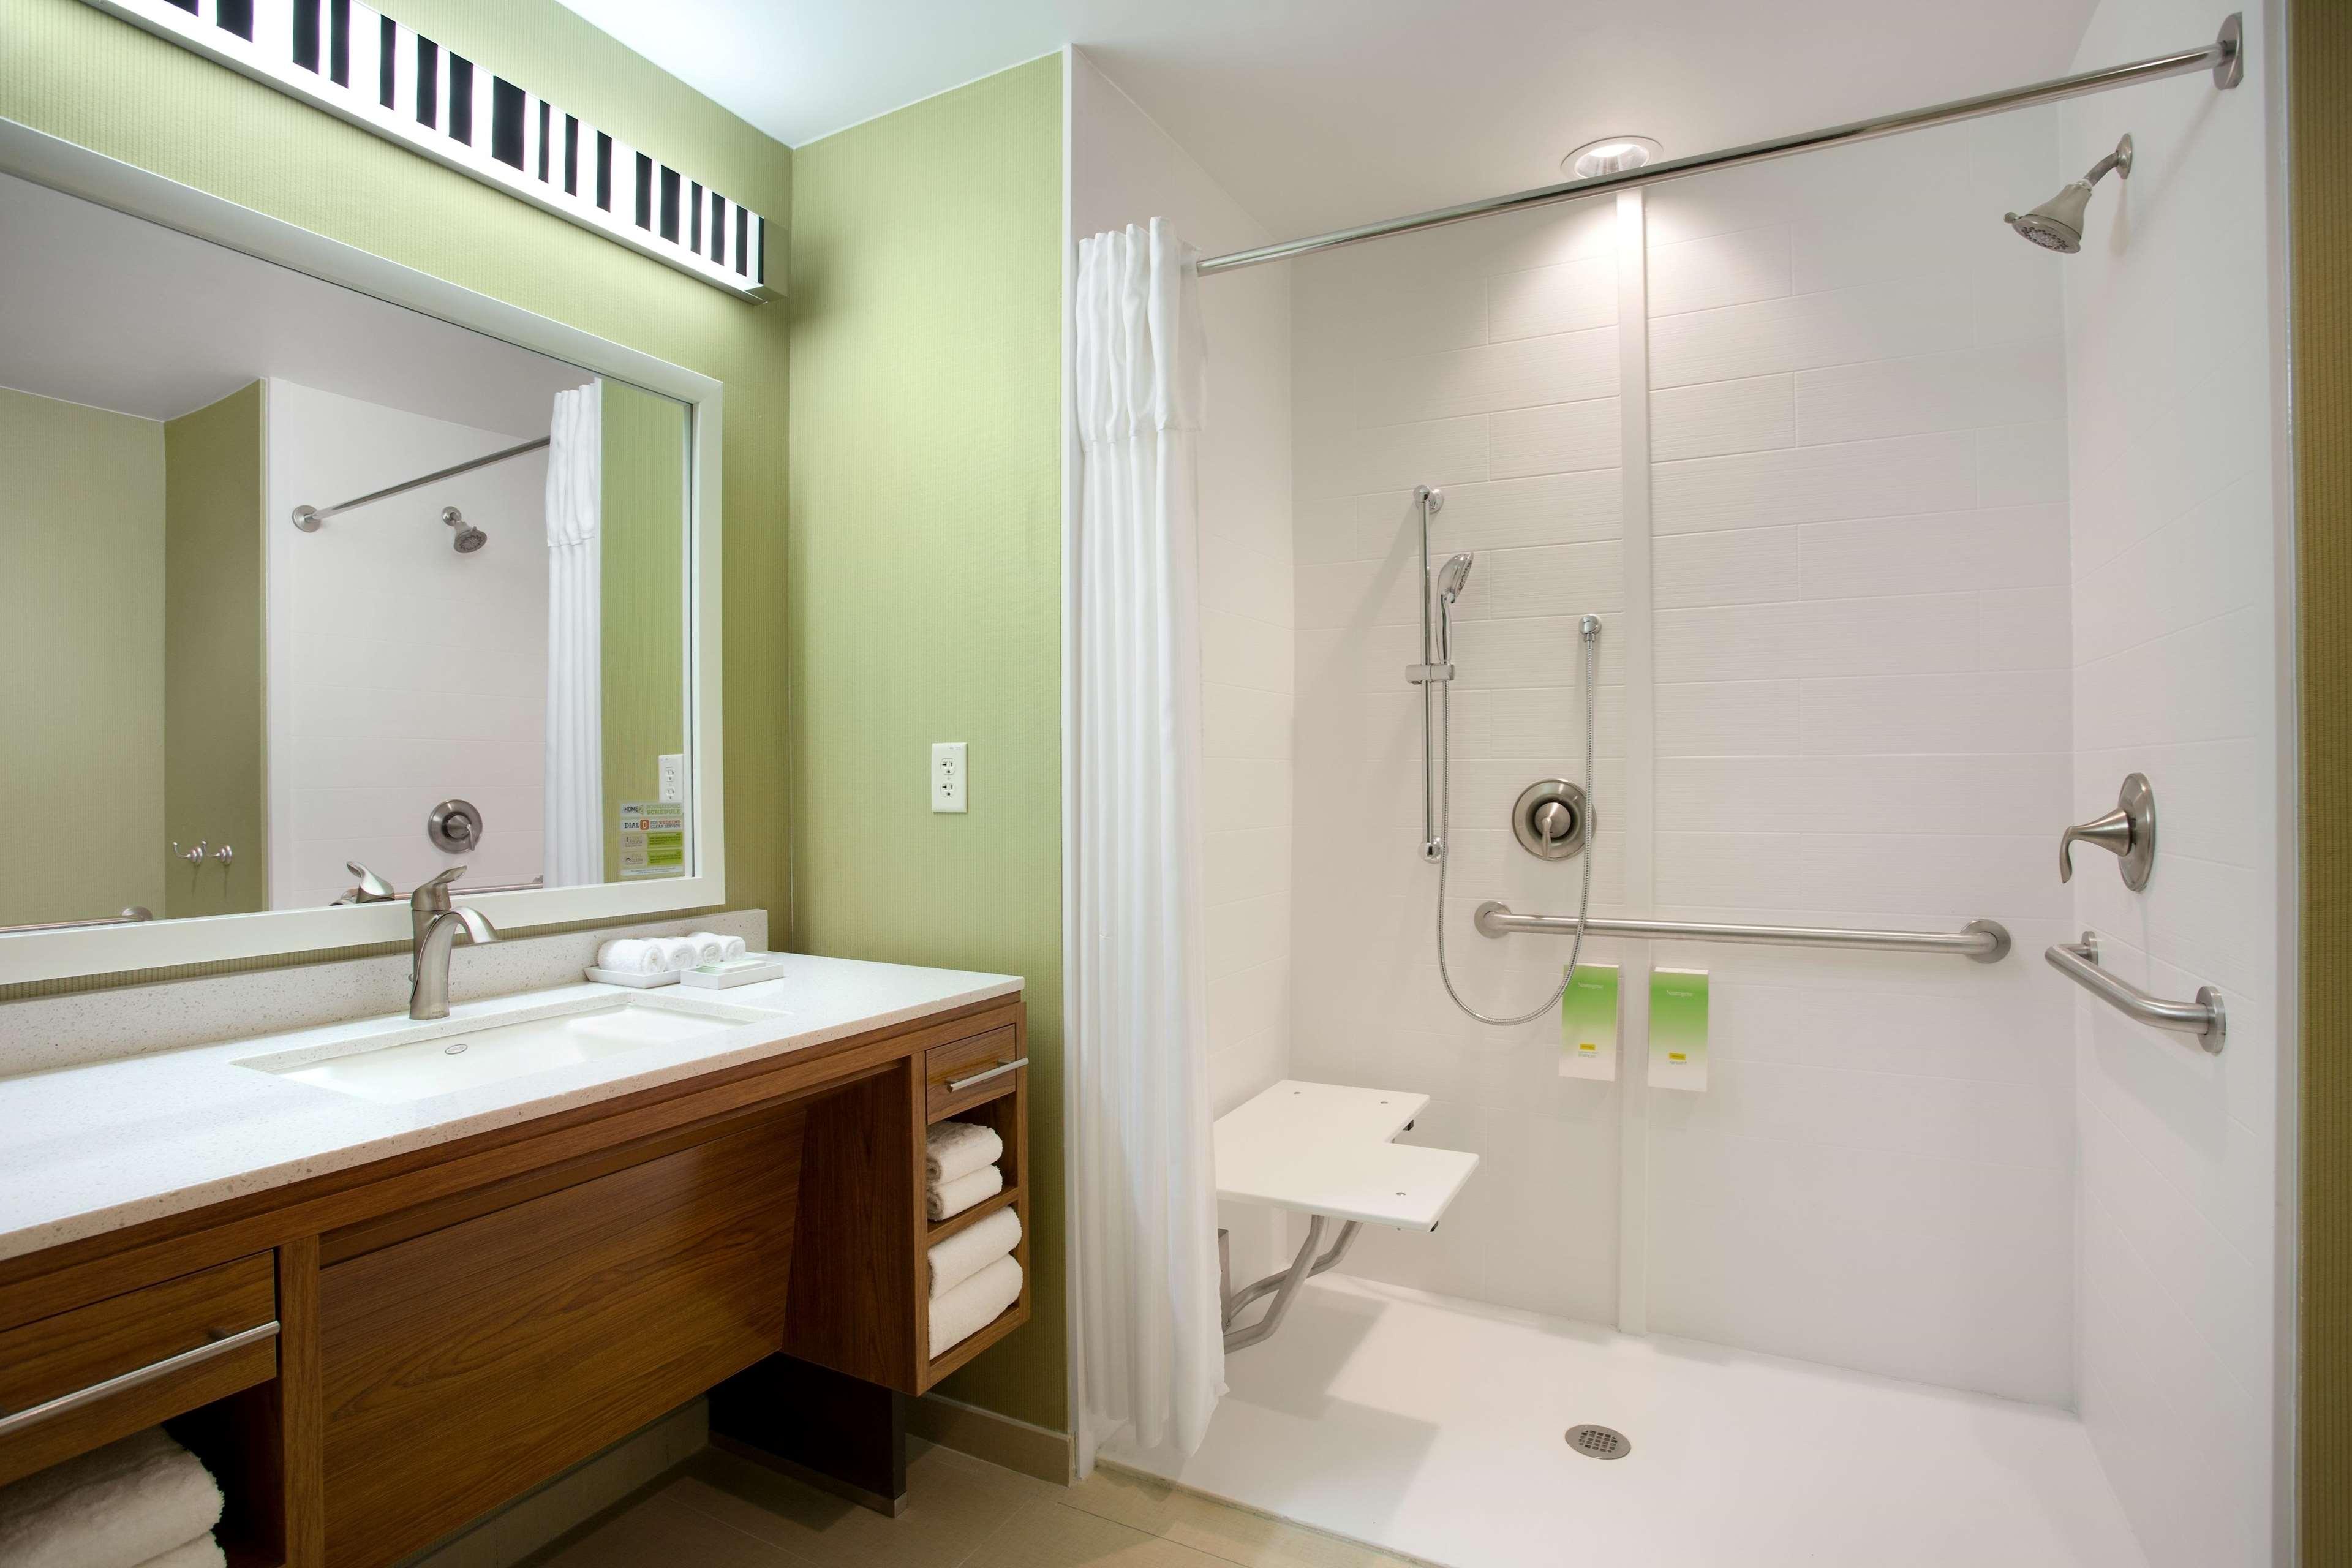 Home2 Suites by Hilton San Antonio Airport, TX image 16